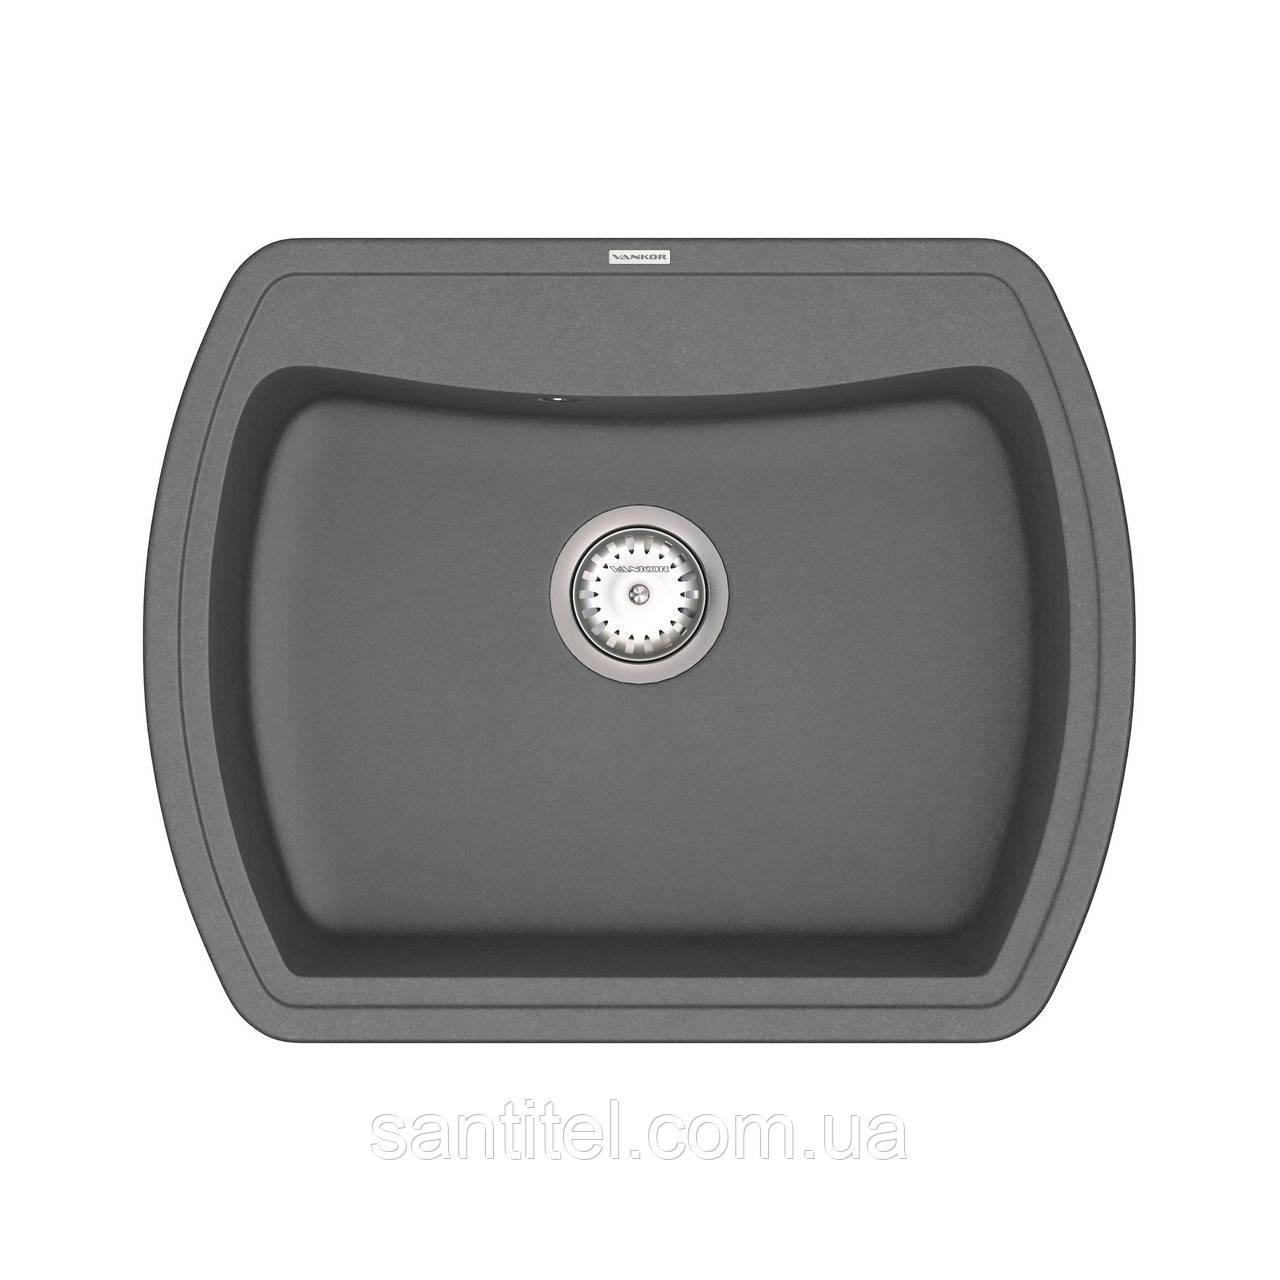 Кухонная мойка VANKOR Norton NMP 01.63 Gray + сифон VANKOR